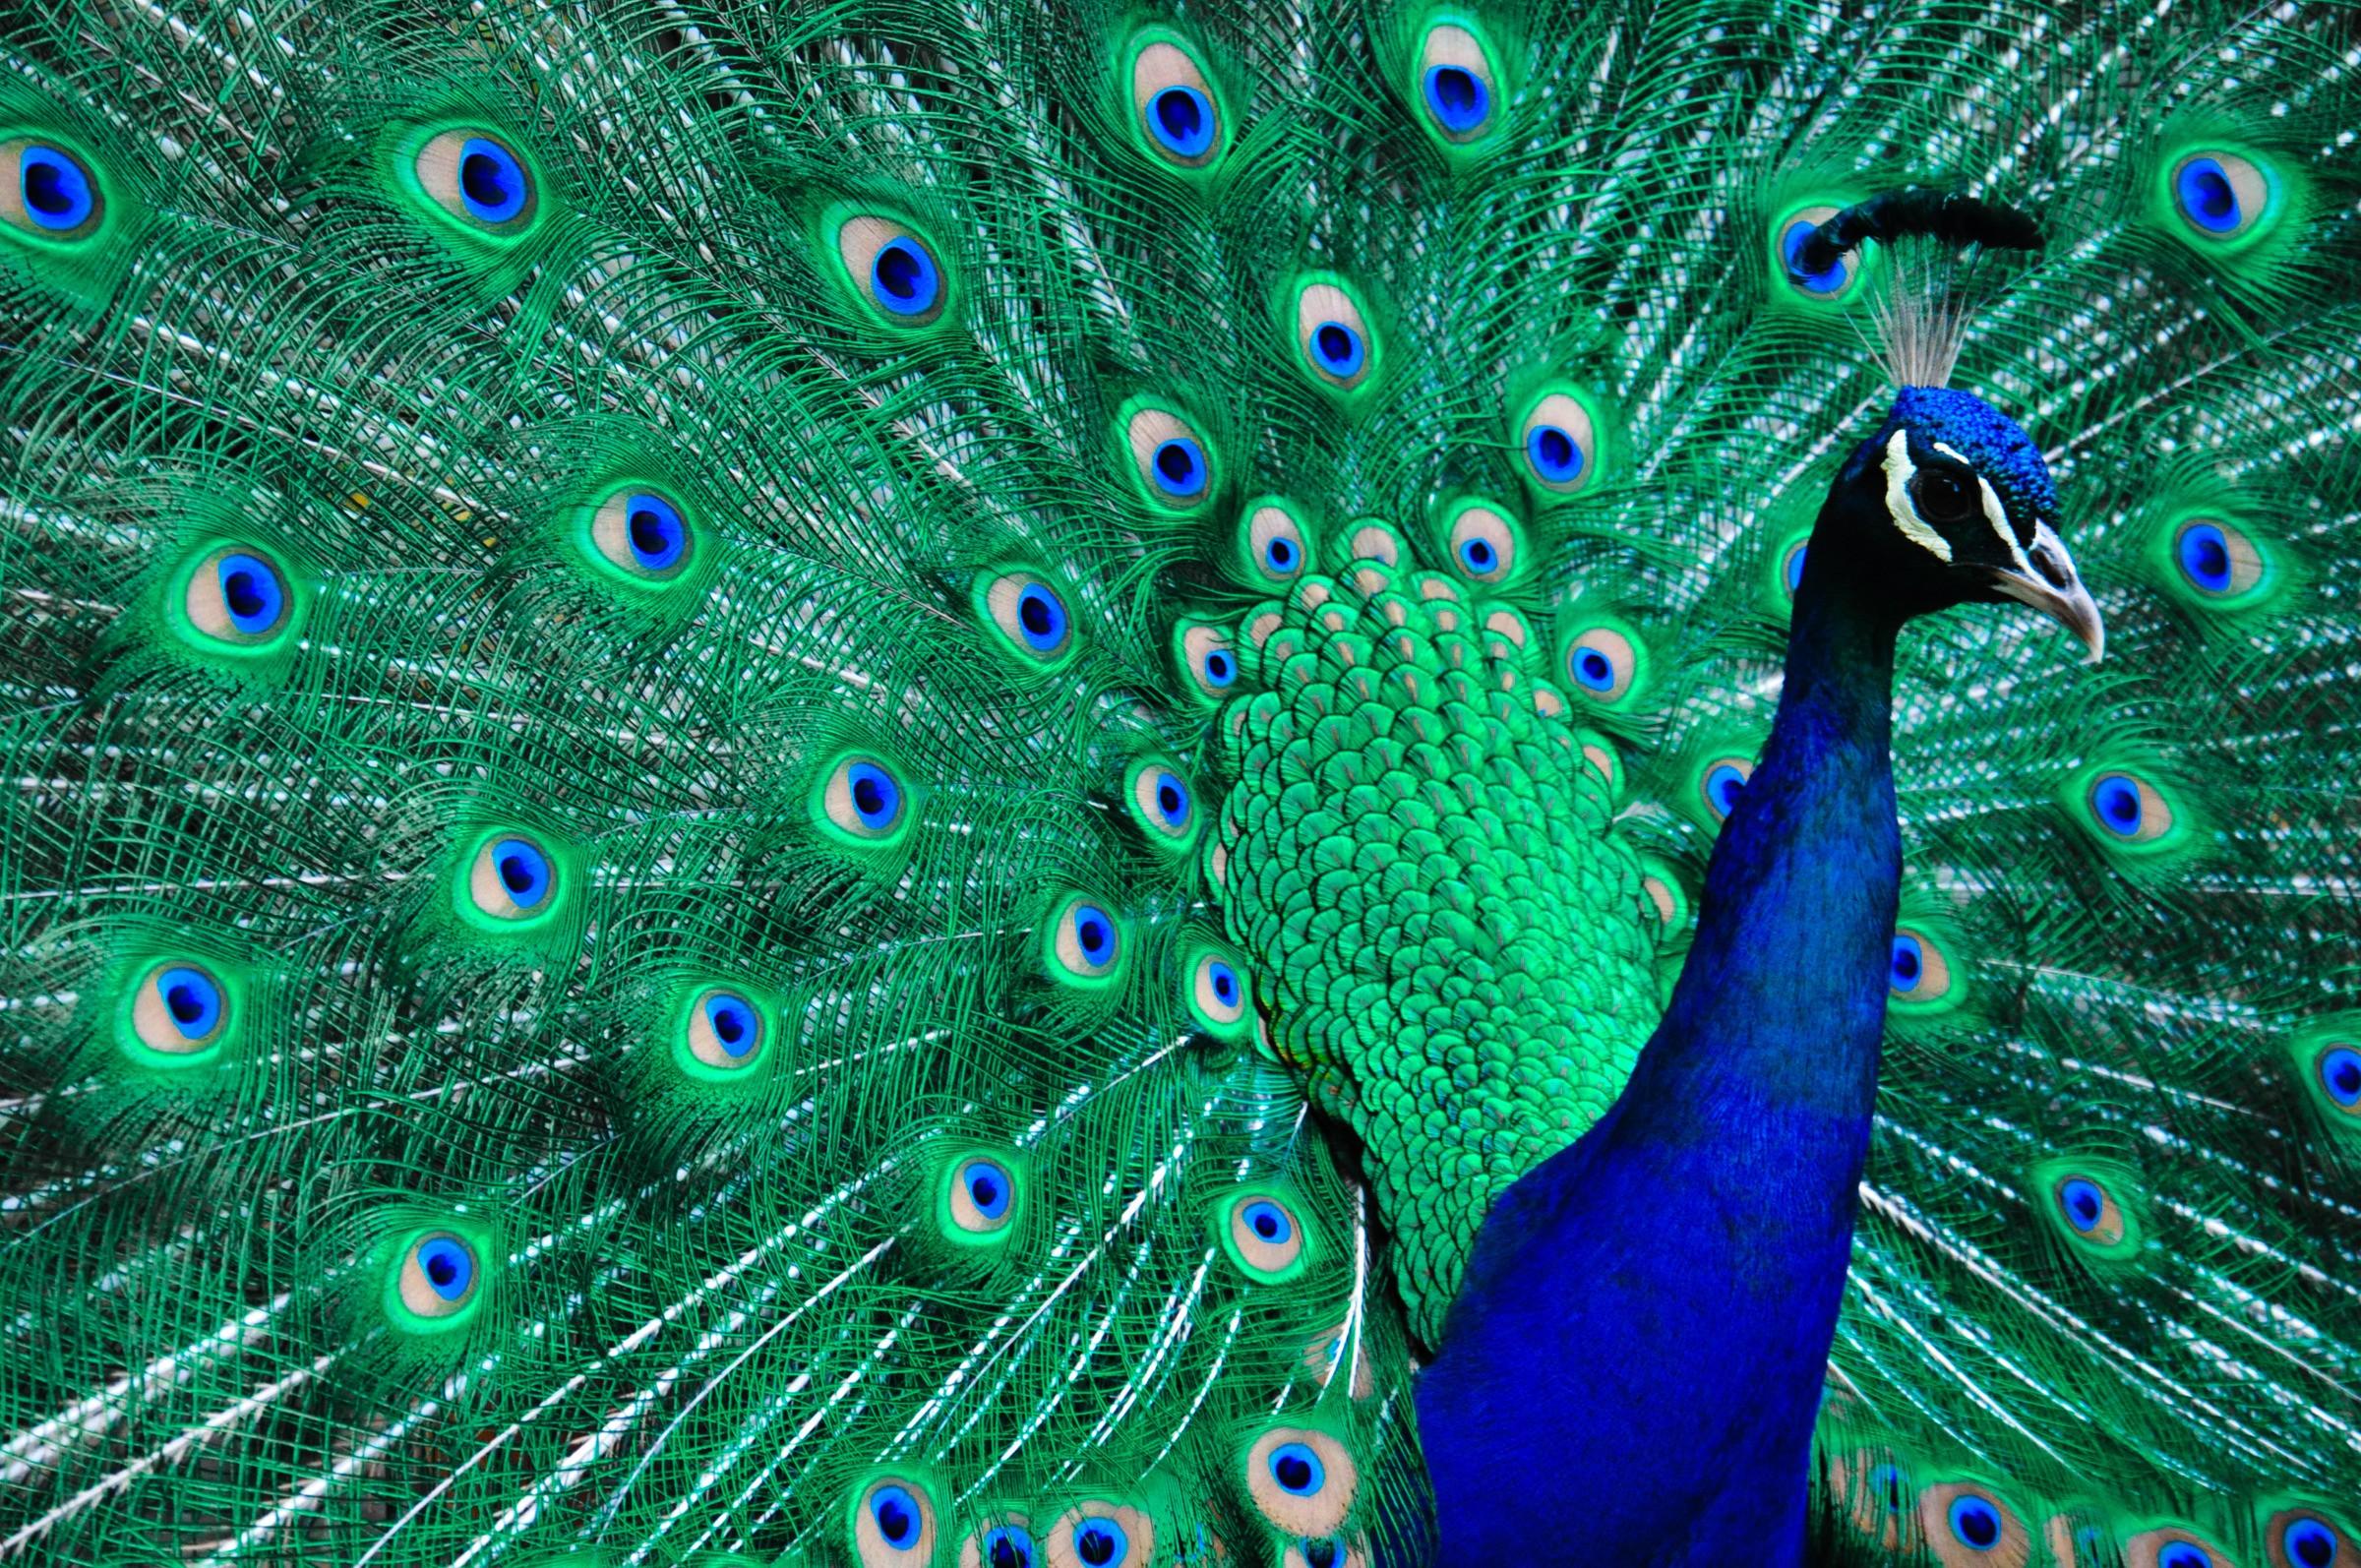 Accountant B, The Peacock on Social Media